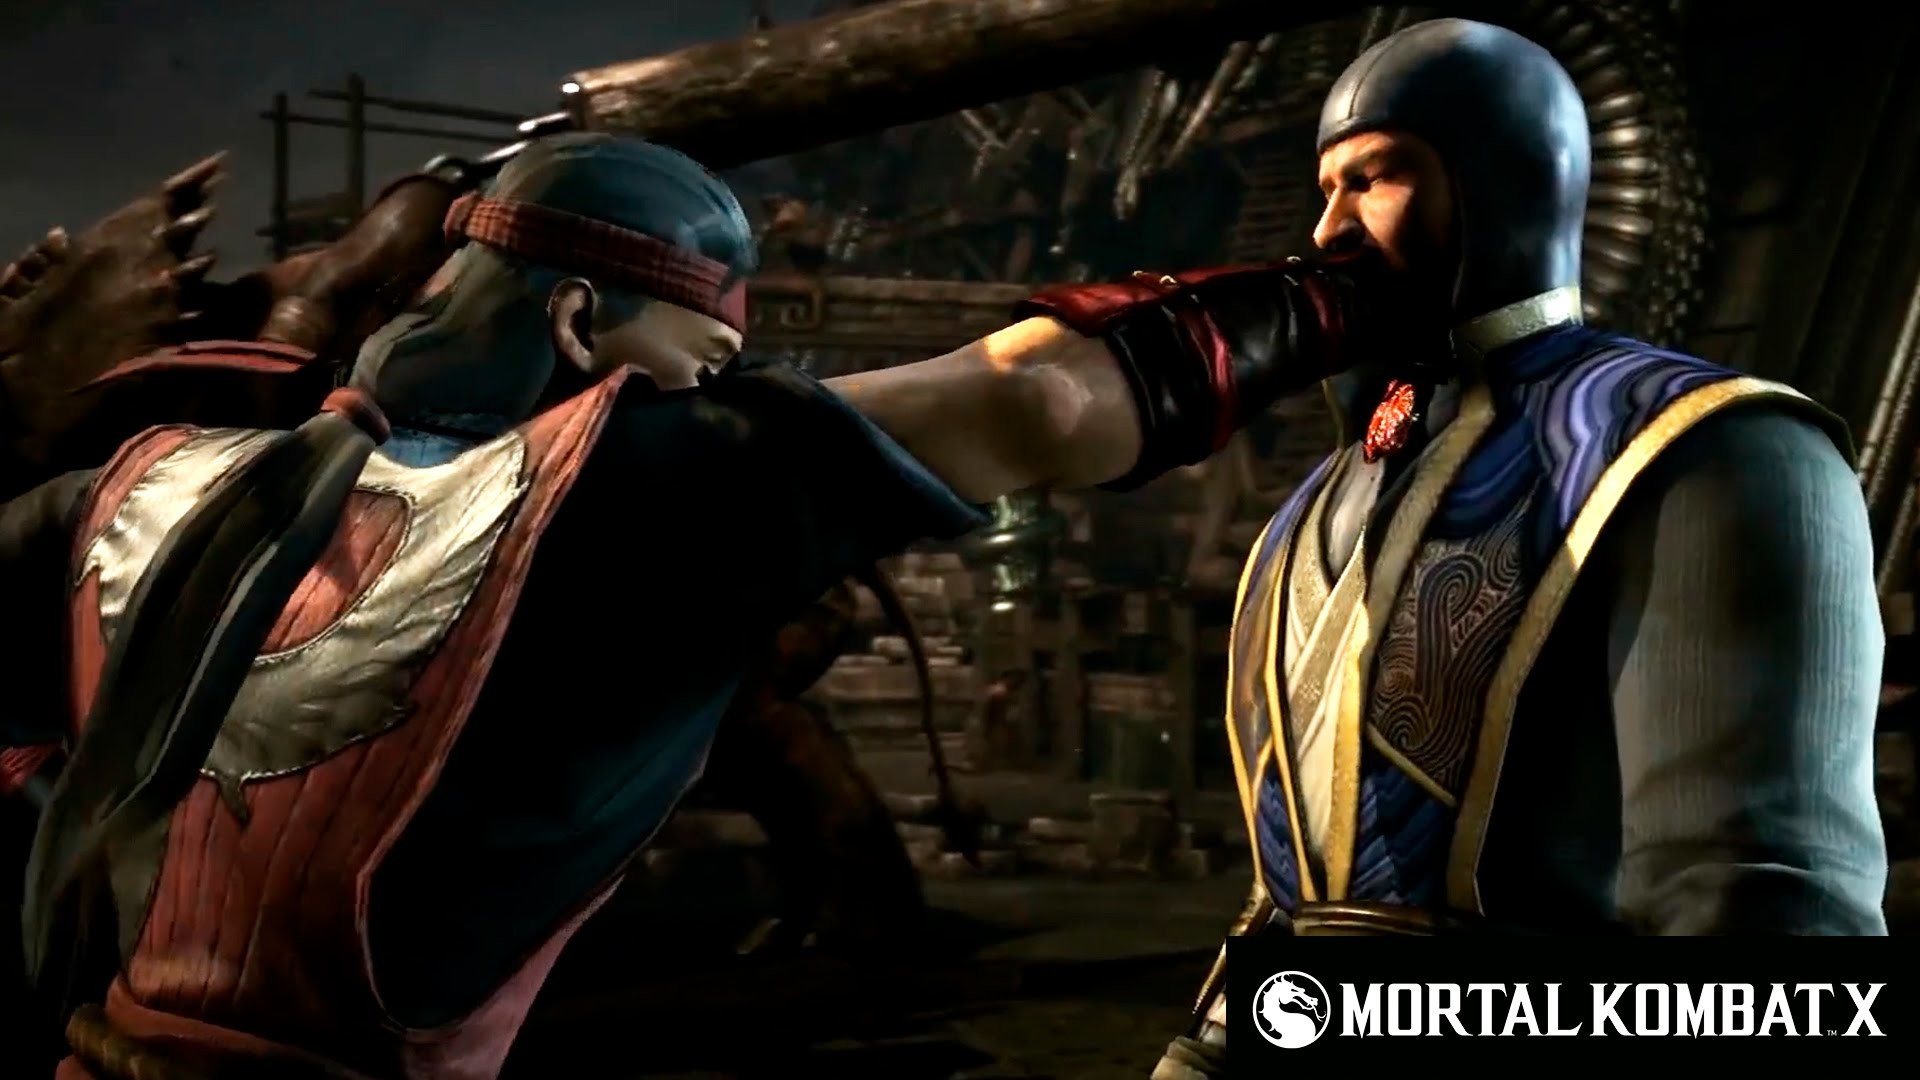 Mortal Kombat X New Fatalities X-Ray #2 Liu Kang, Shinok,Kung Jin, Kitana,  Mileena Update 2015 – YouTube